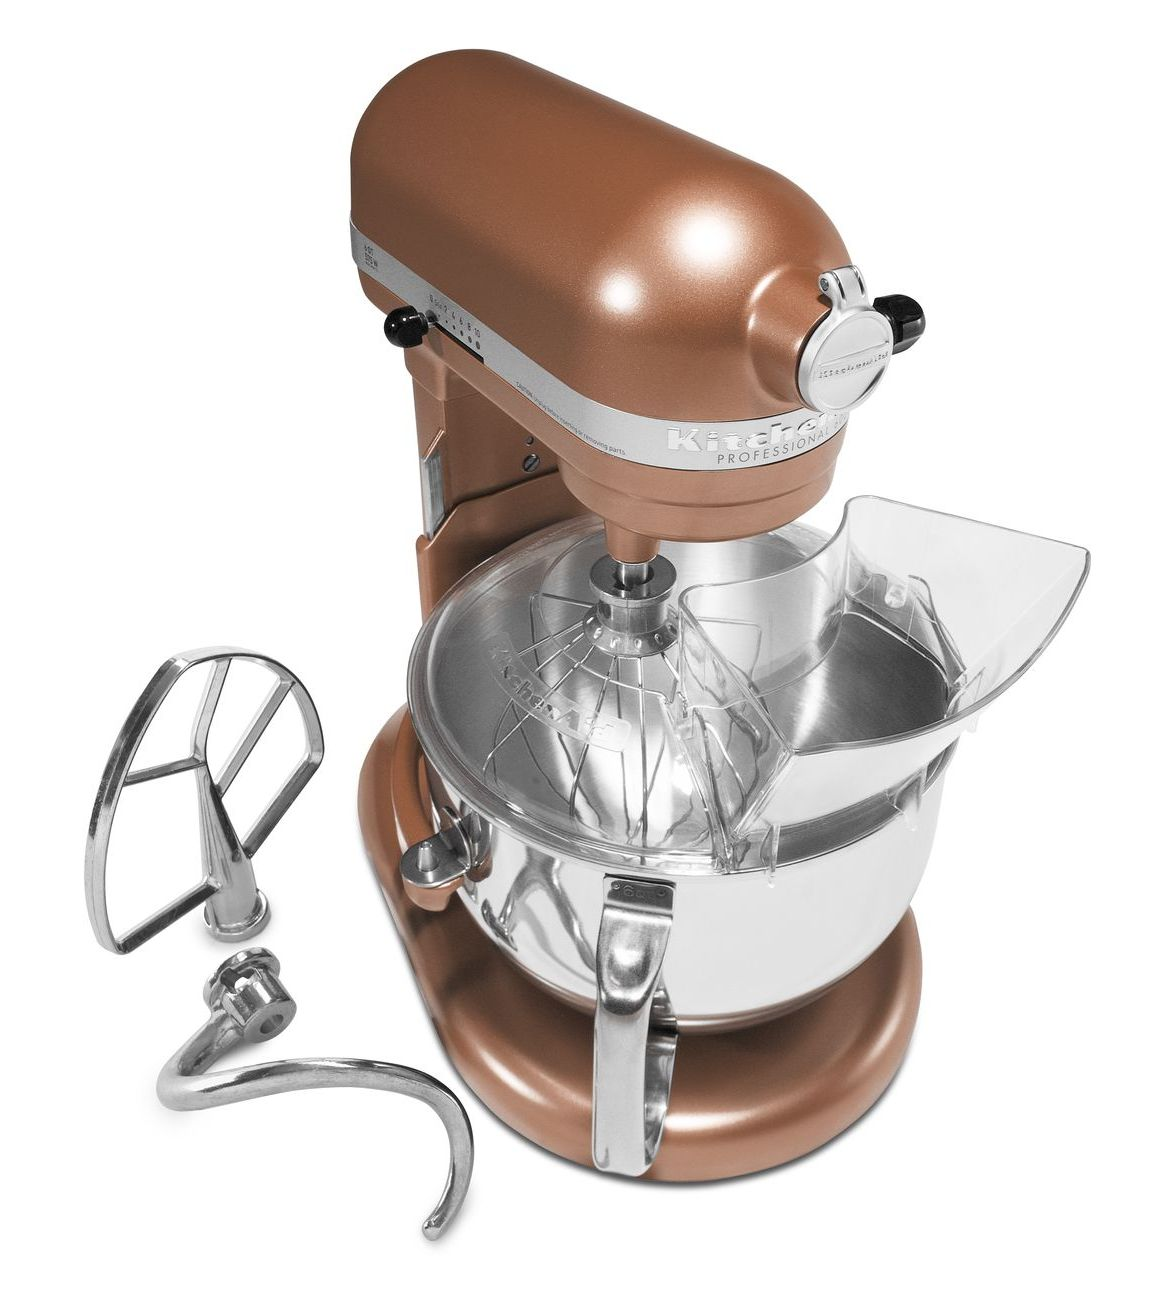 kitchen aid pro 600 tuscan style kitchenaid series 6 quart bowl lift stand mixer walmart canada